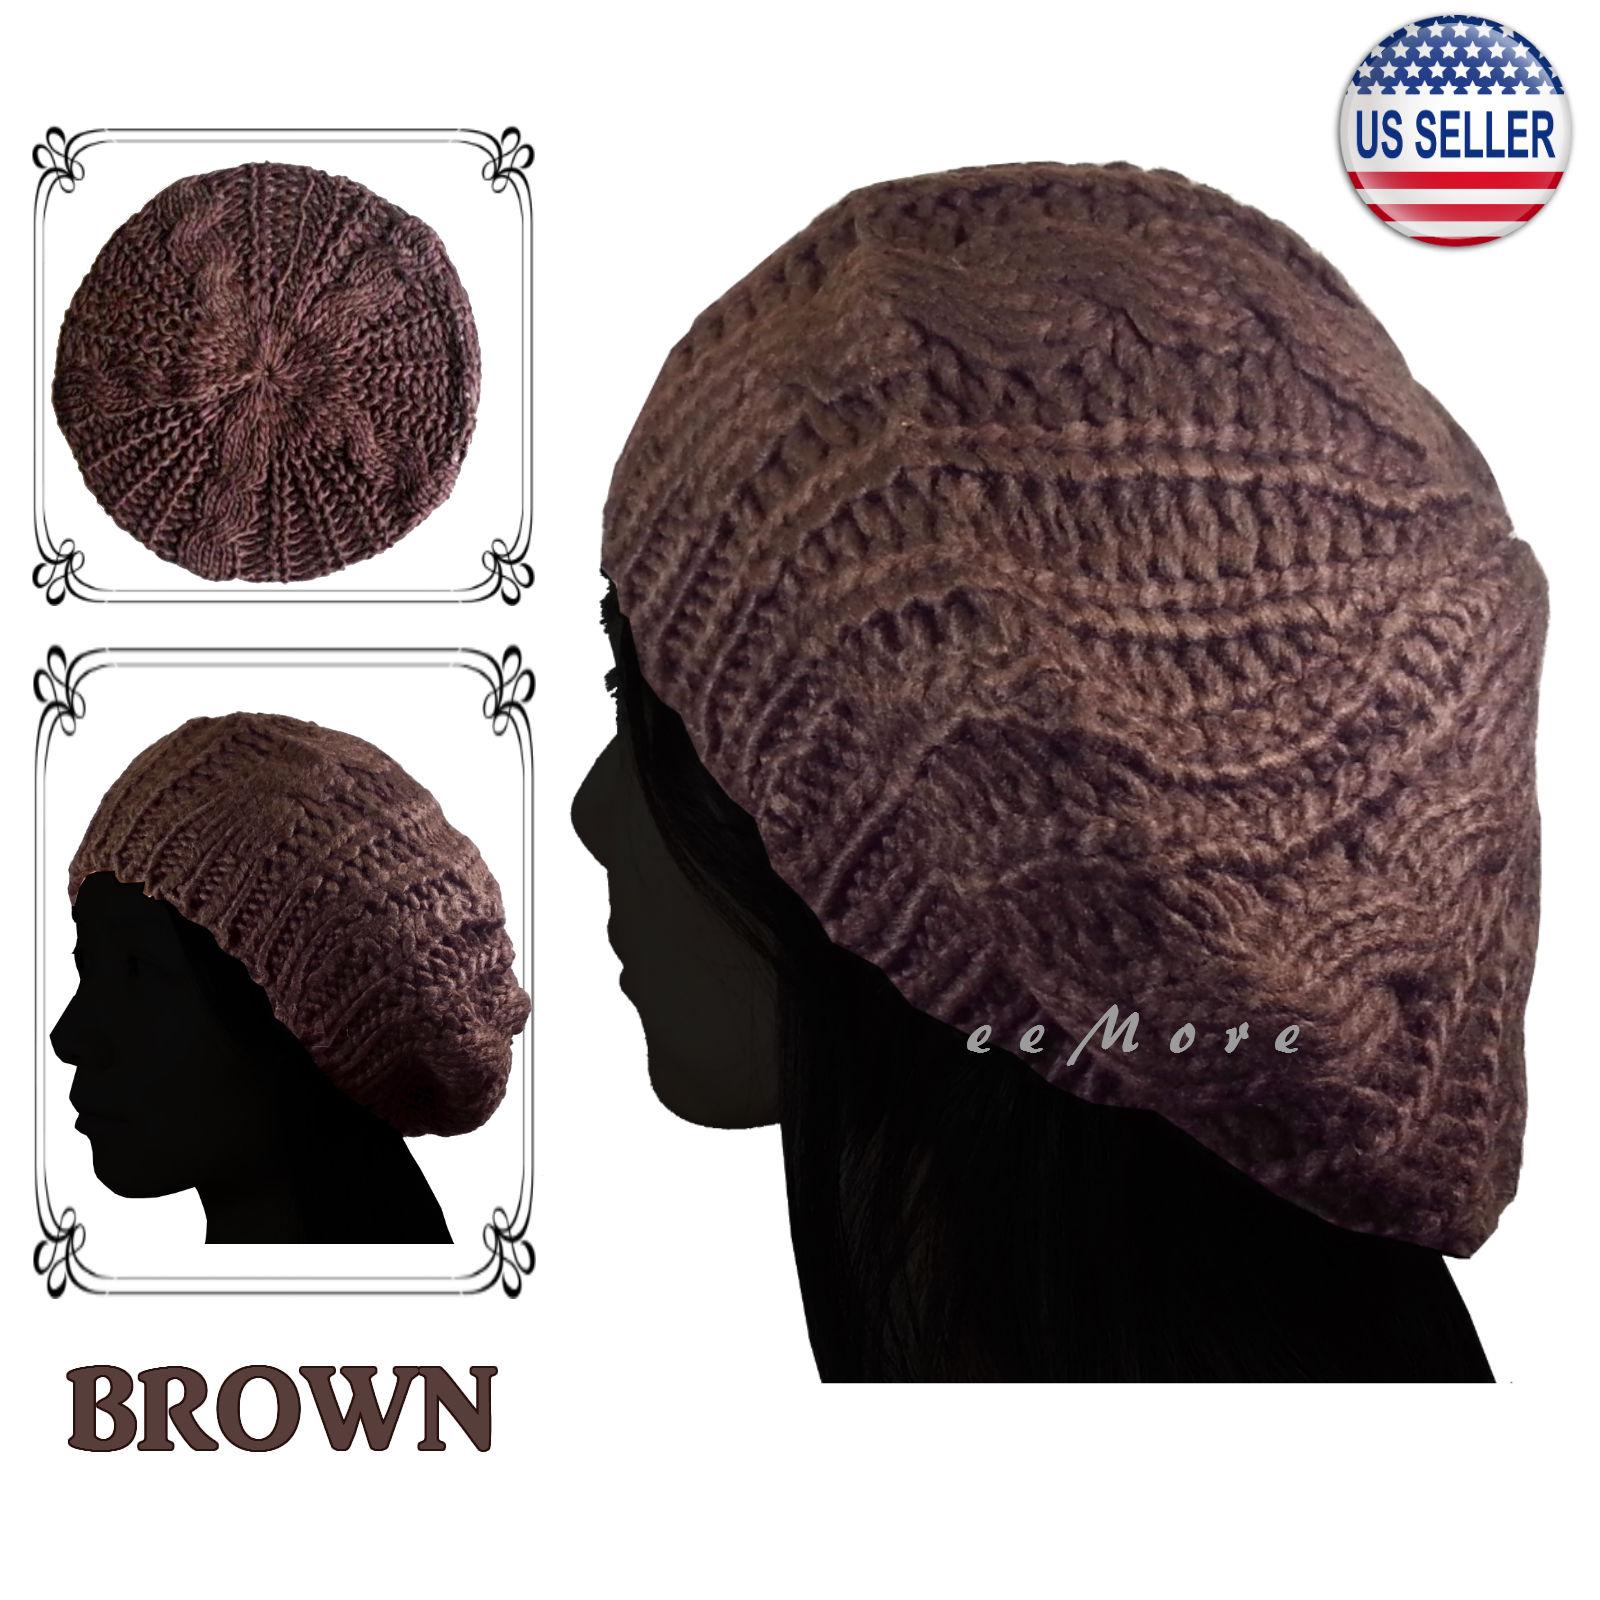 Details about Knitted Beret Crochet Braided Hat Beanie Cap Women Winter  BROWN US Stock 25b3a82d5b